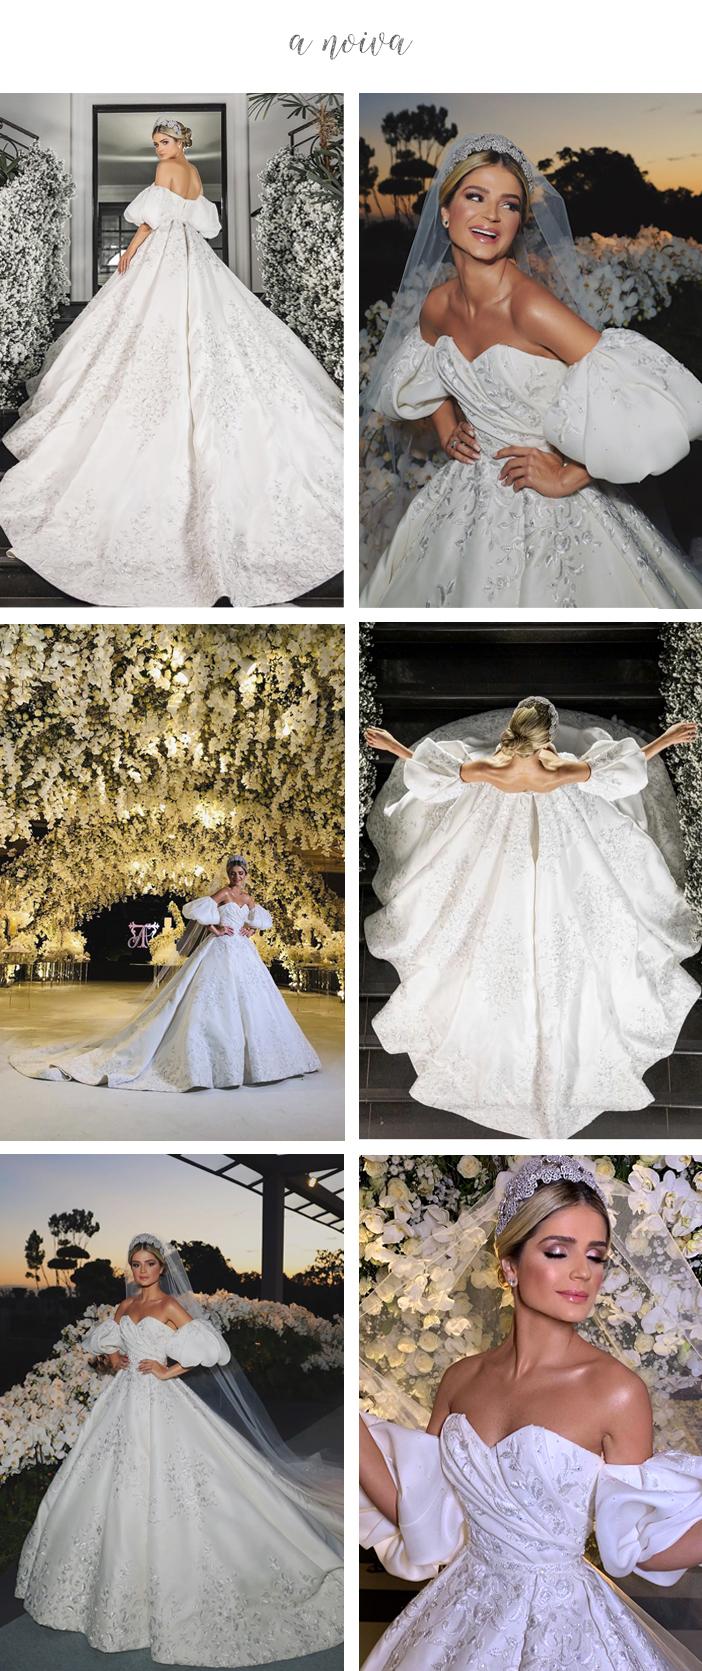 Layla Casamenteira - Thássia Naves e Artur - A Noiva